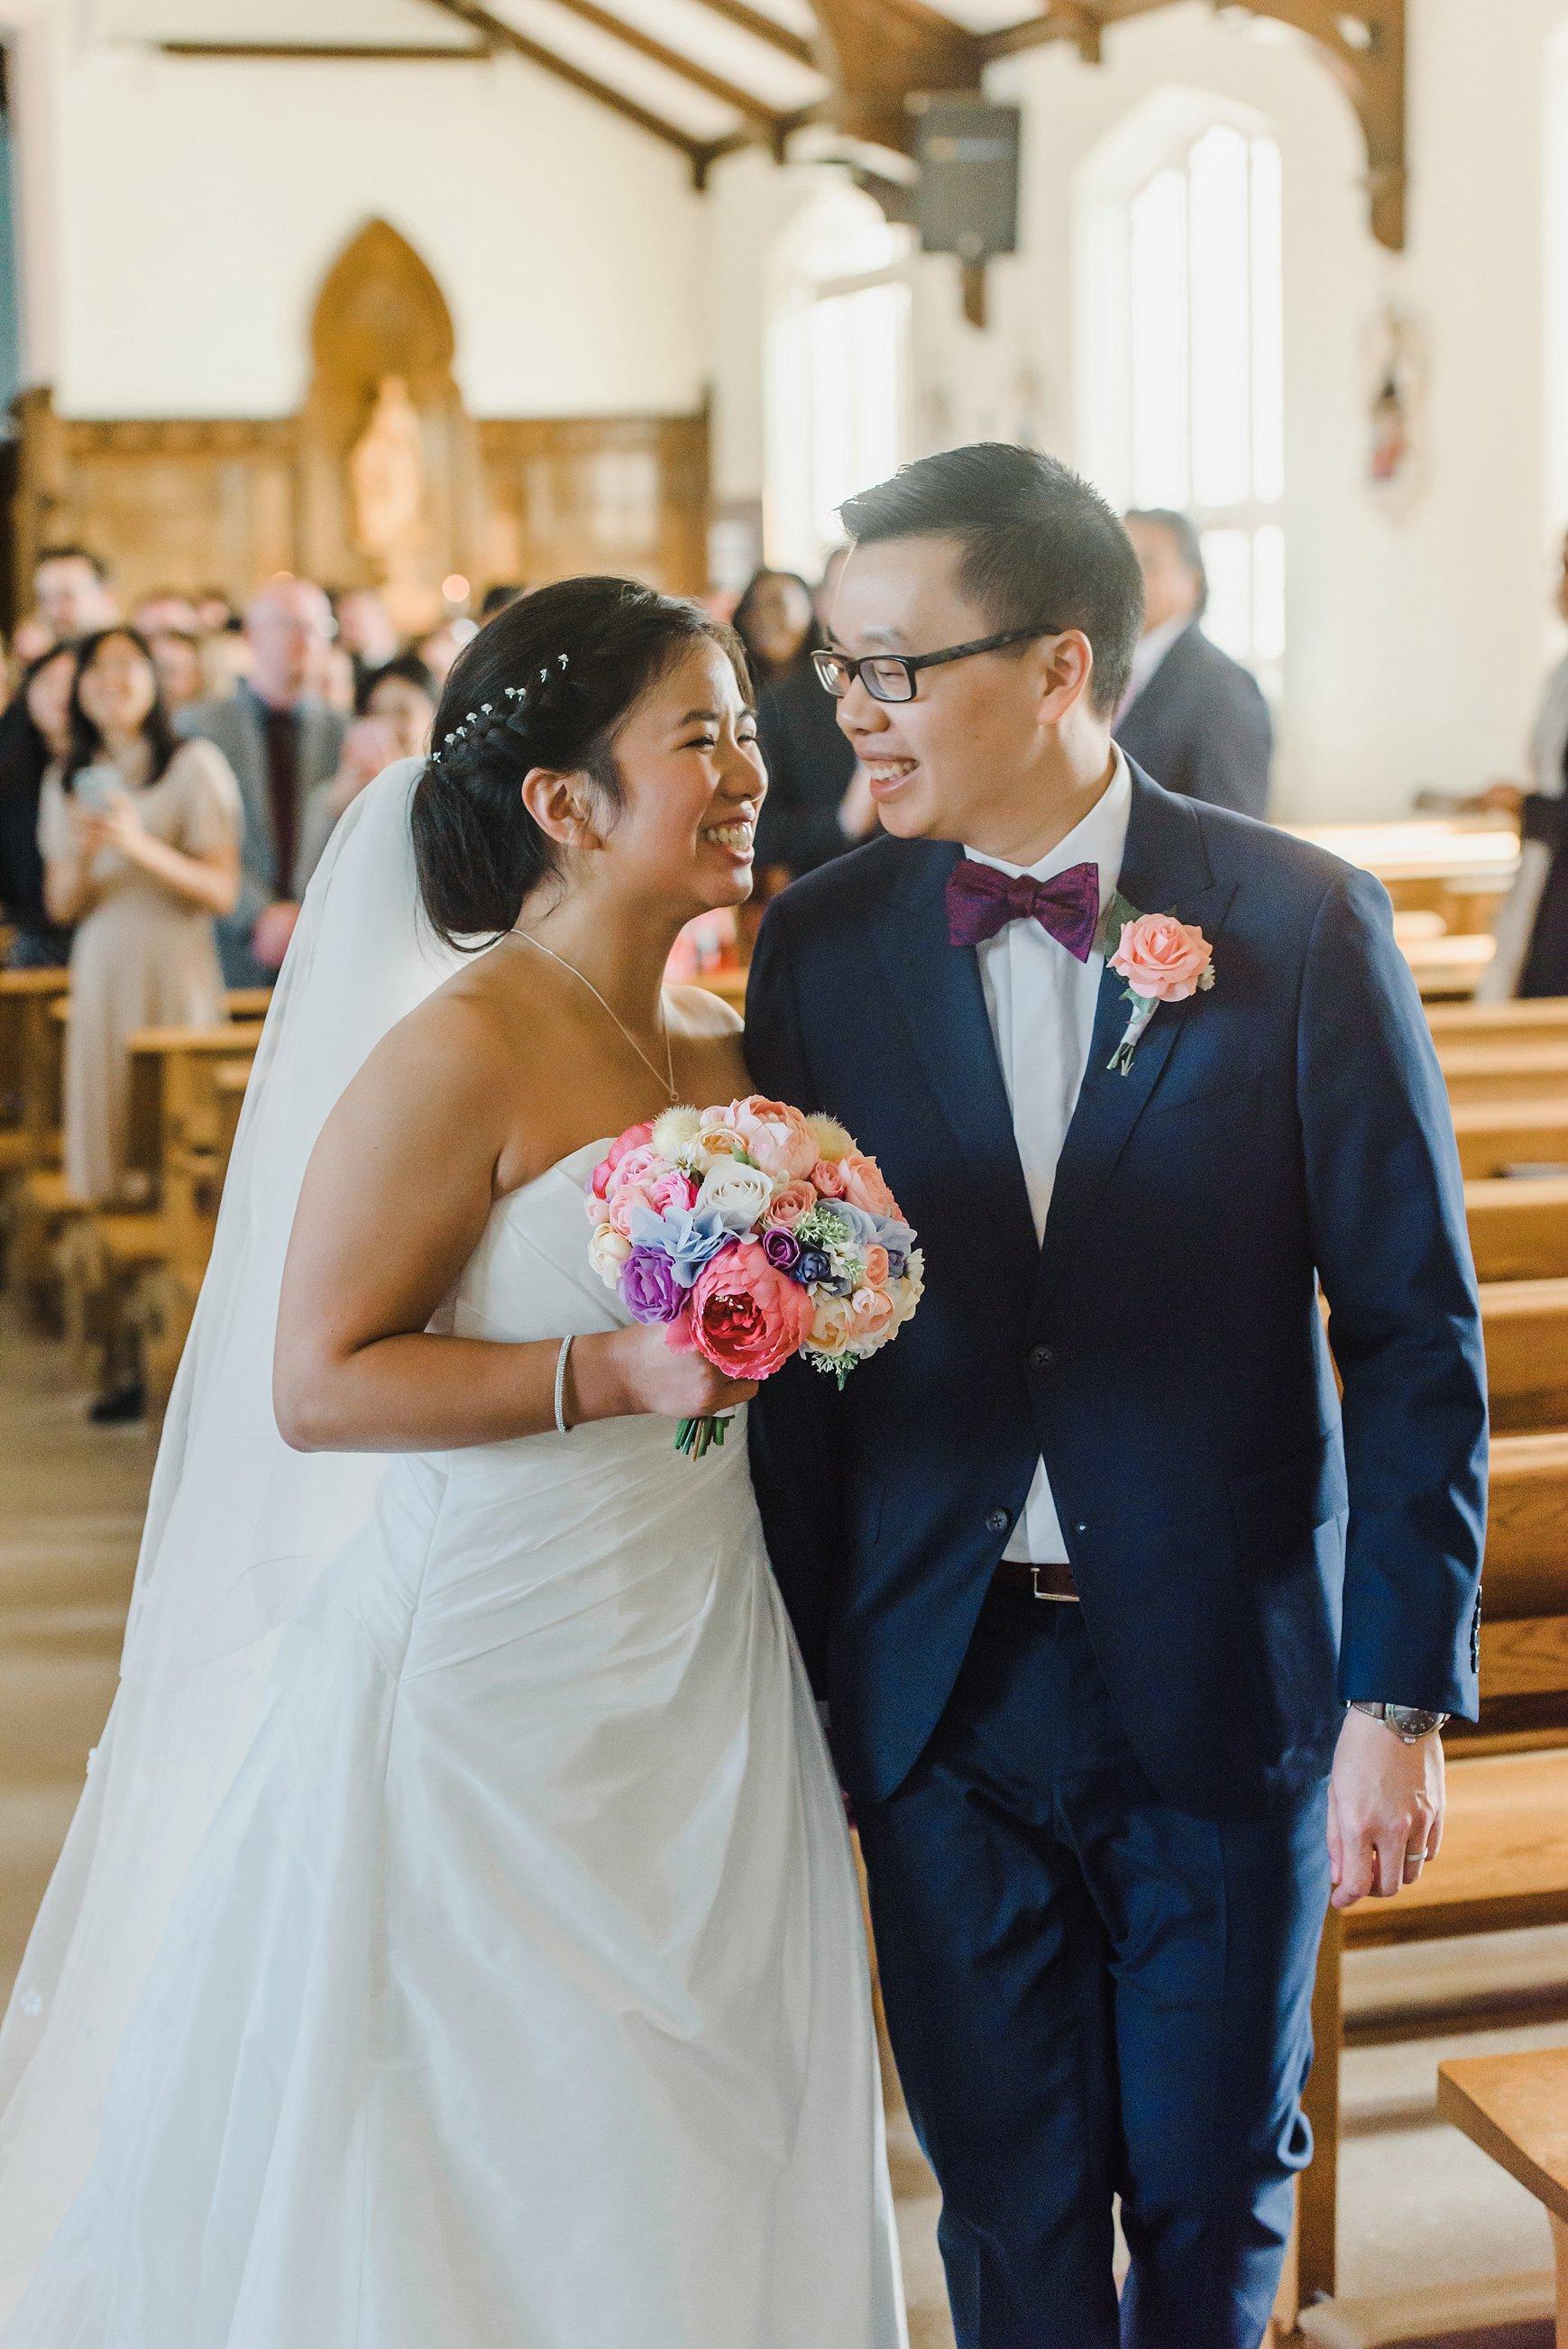 light airy indie fine art ottawa wedding photographer | Ali and Batoul Photography_1492.jpg